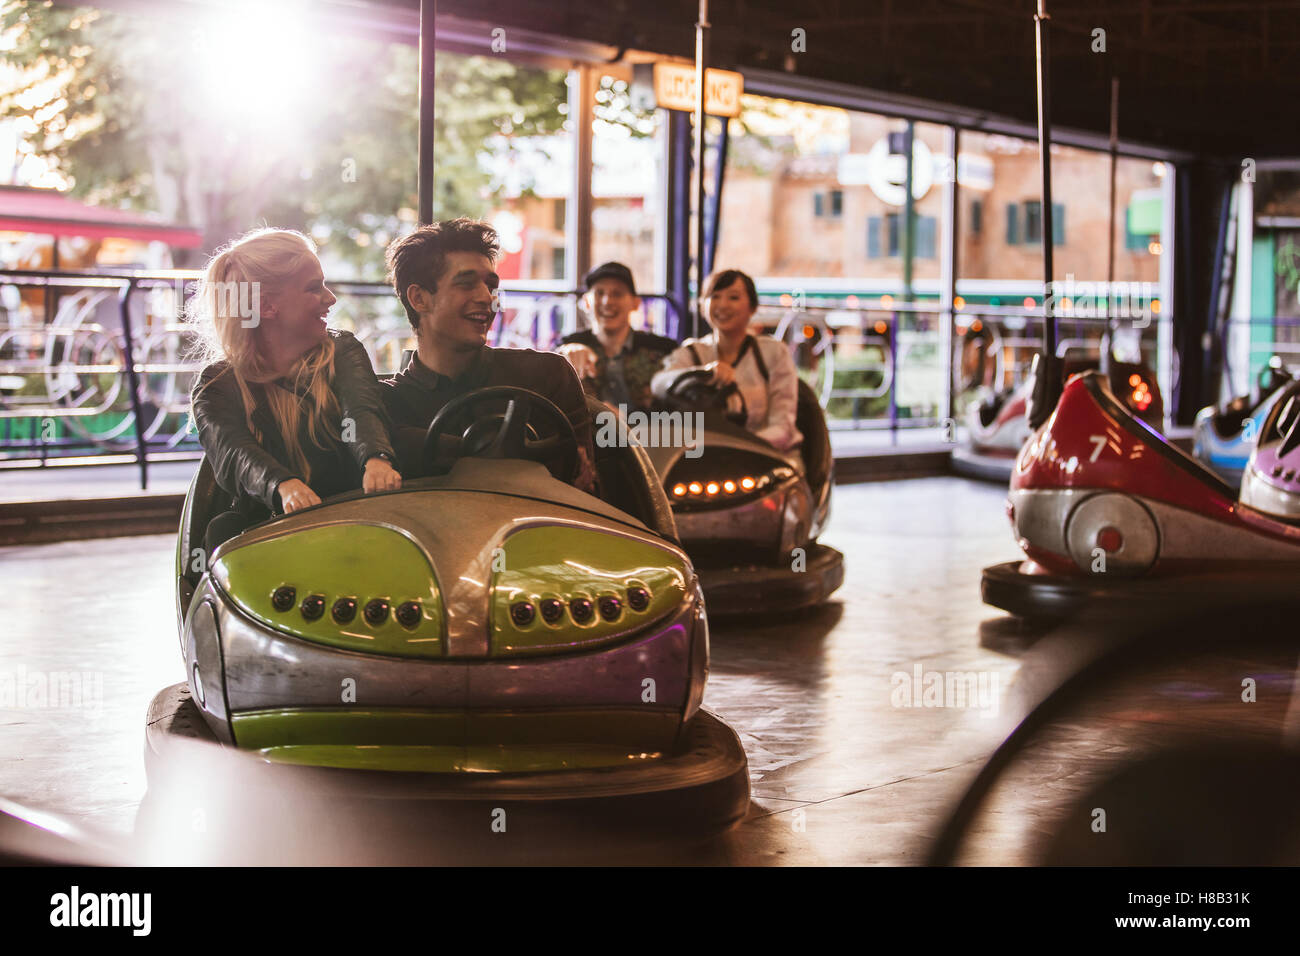 Young people driving bumper car at fairground. Young friends having fun riding bumper car at amusement park. - Stock Image